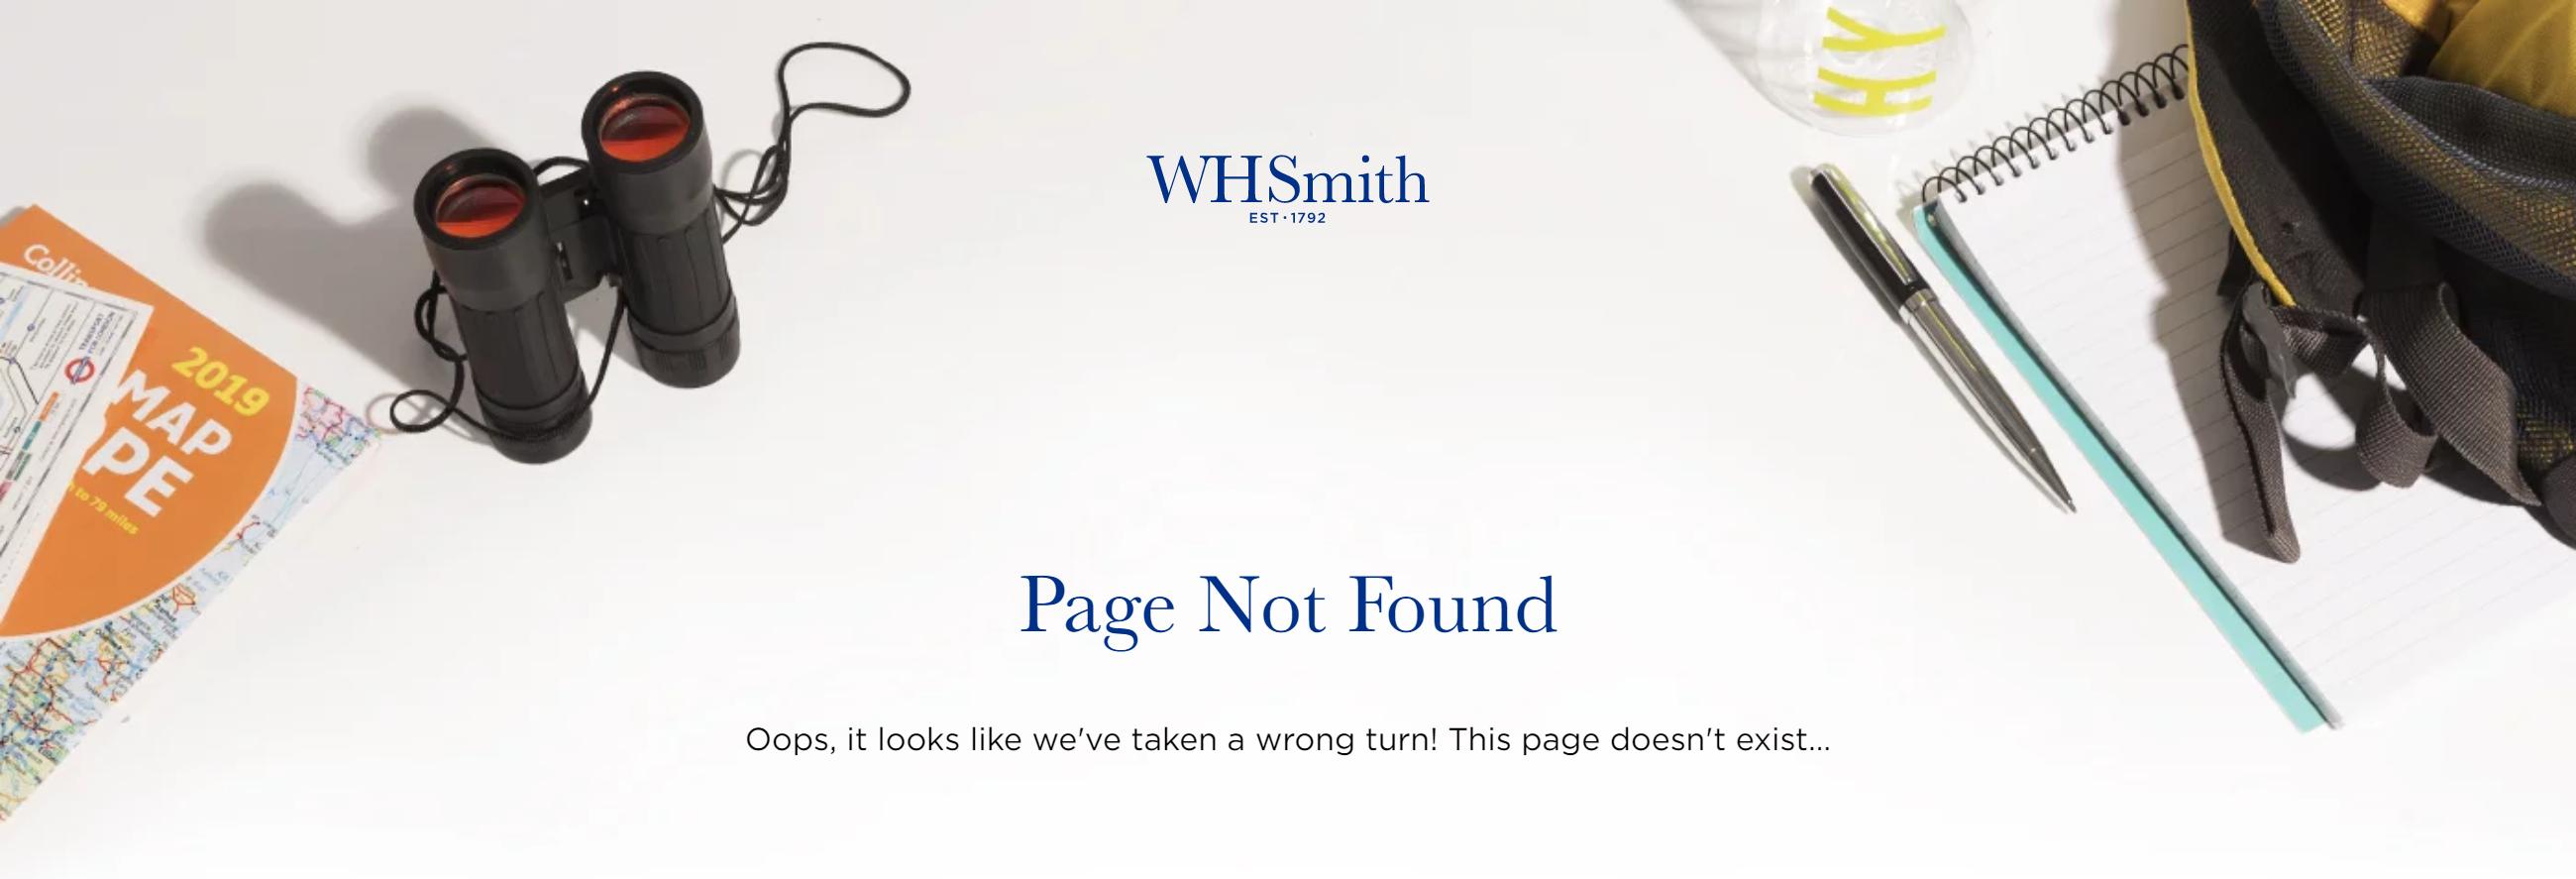 whsmith 404 page